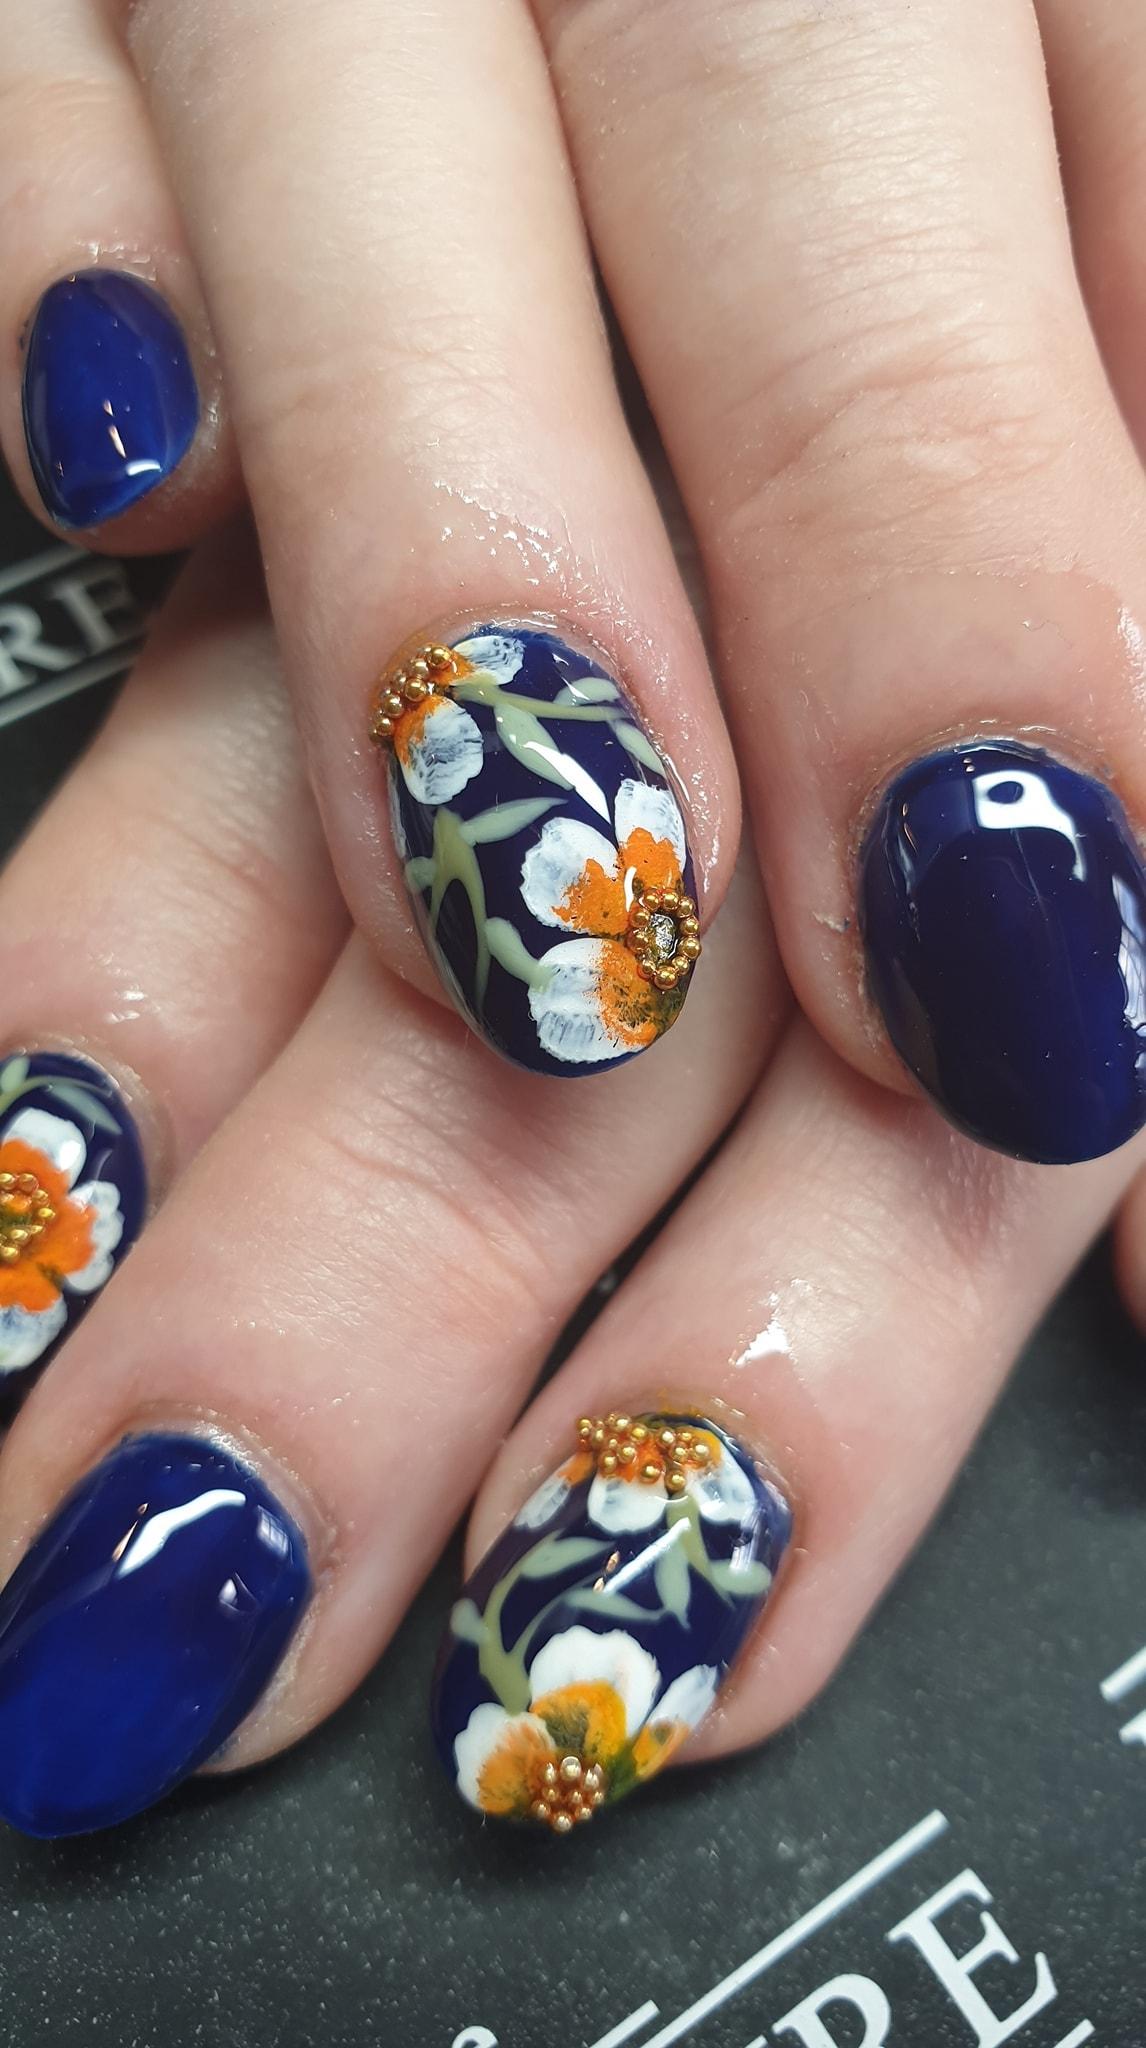 onestroke nails